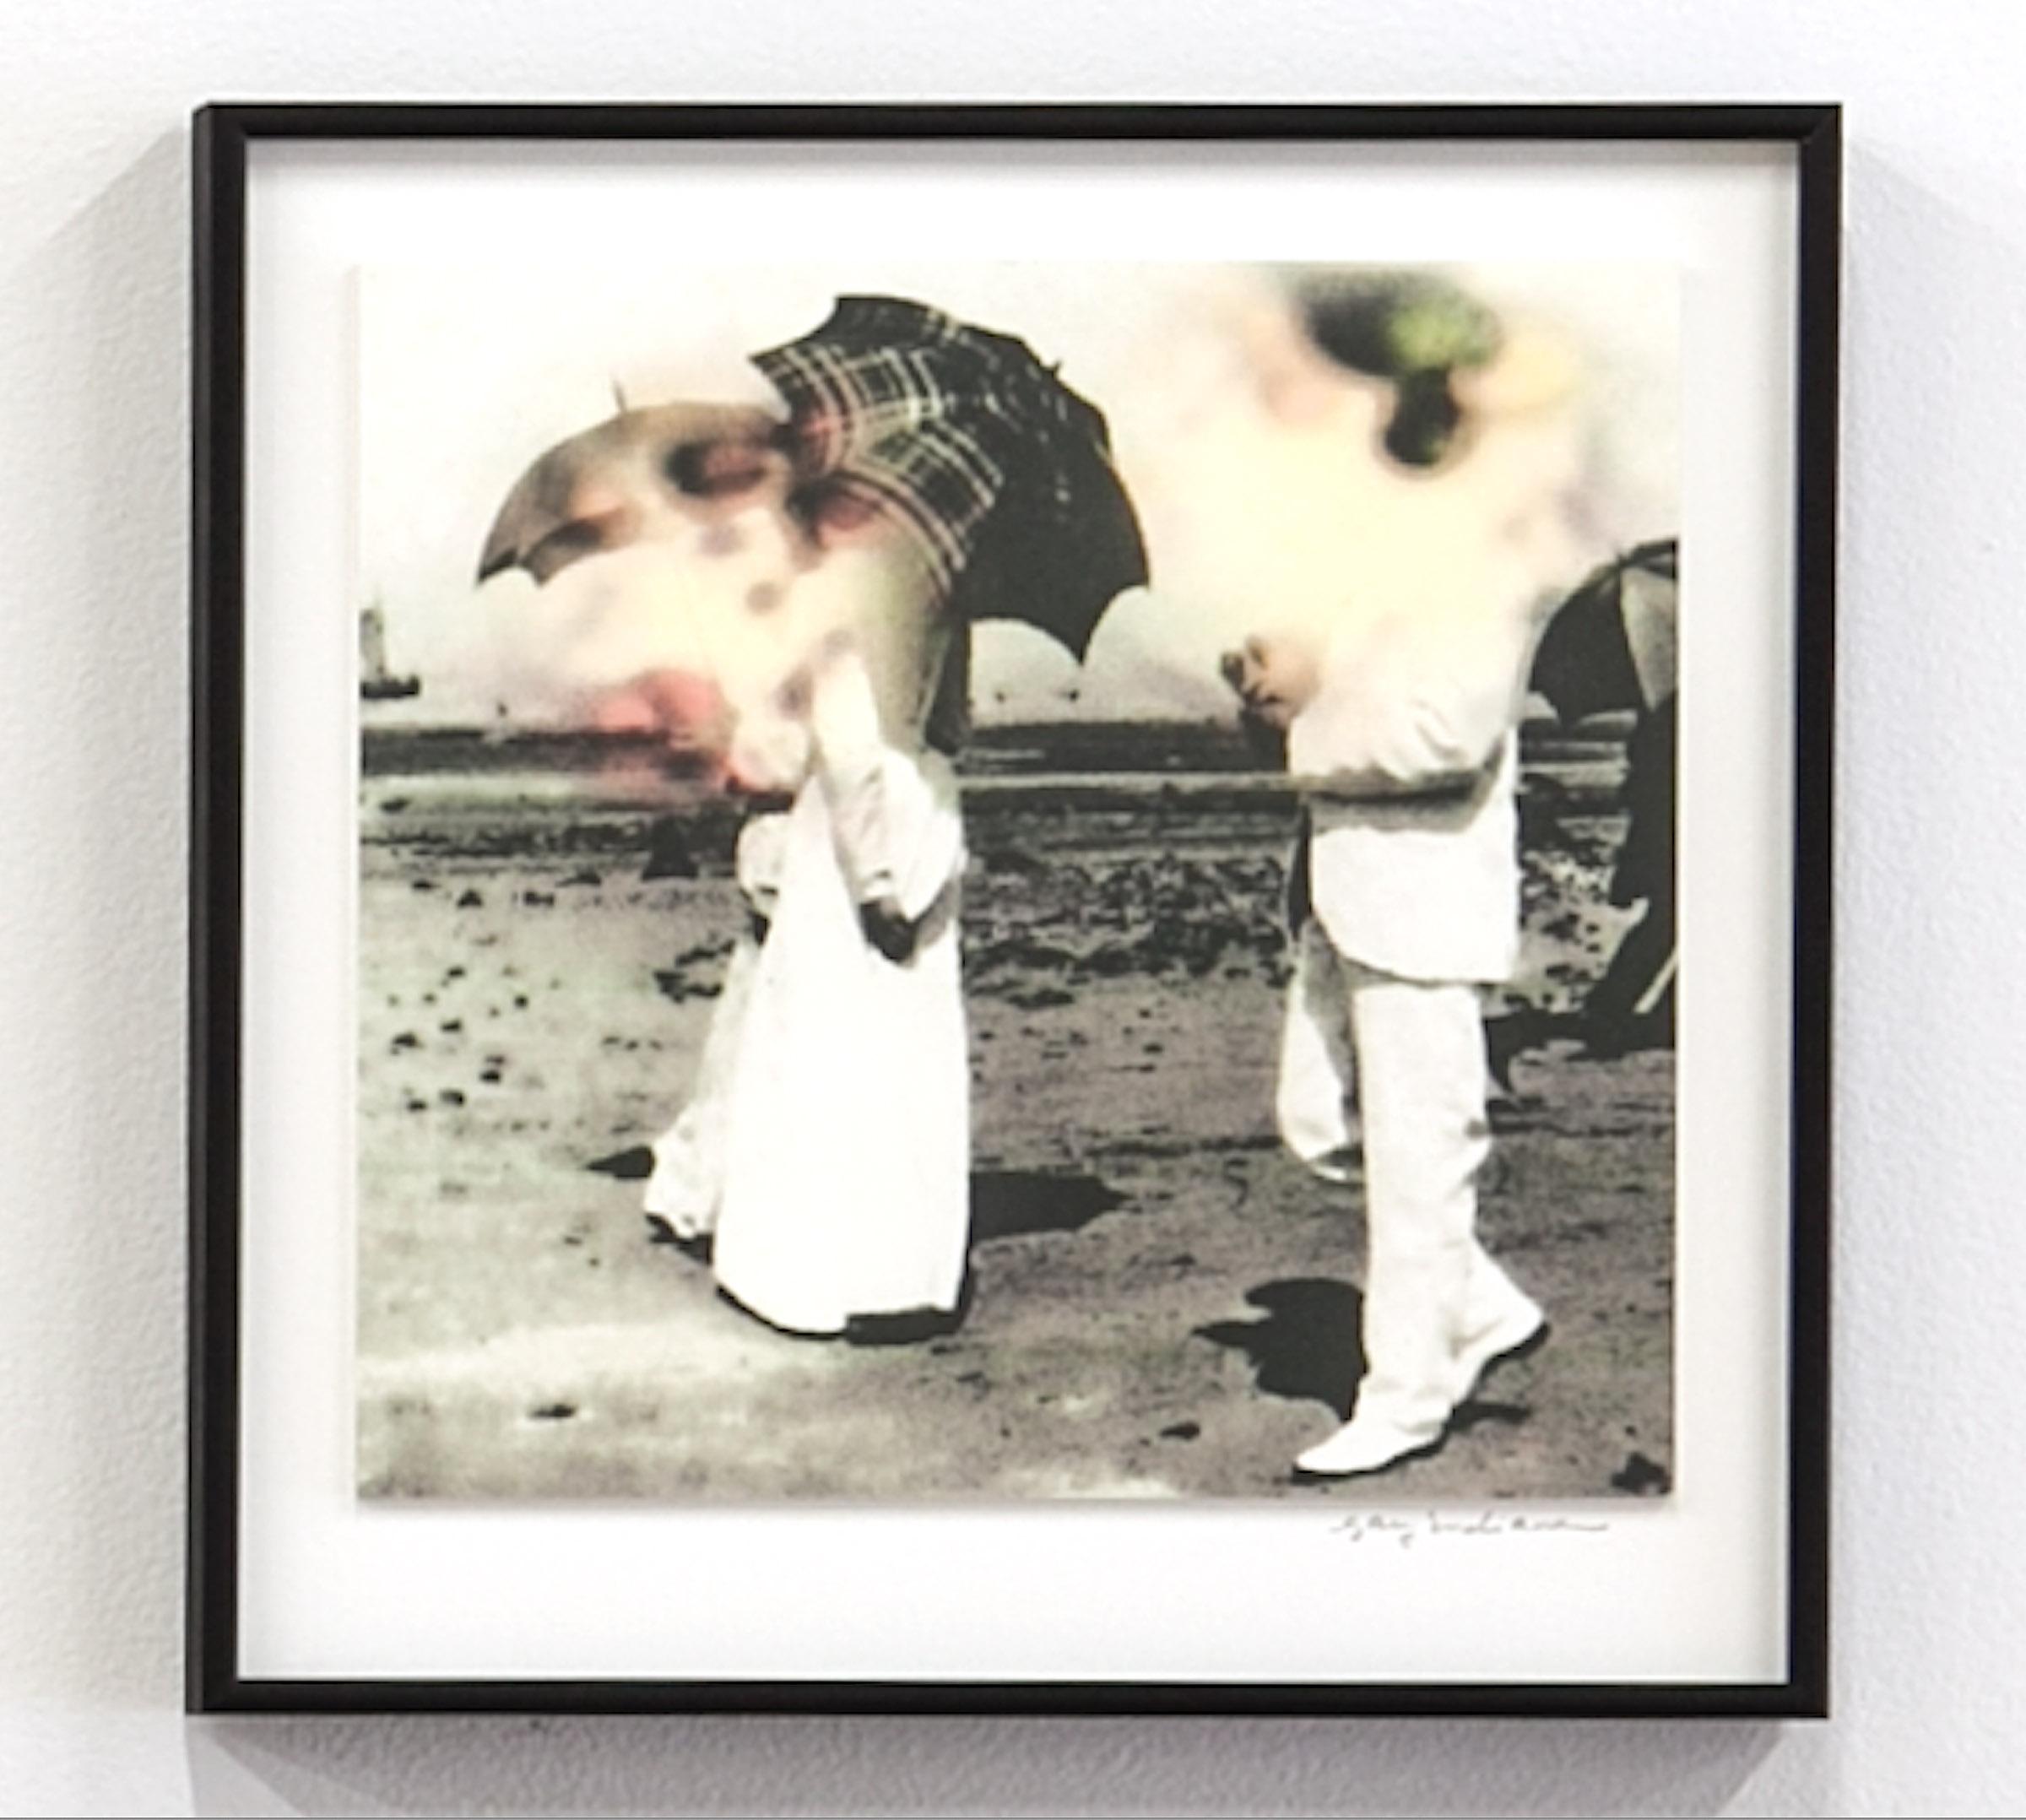 Untitled (After Lartigue), 2013 (top)